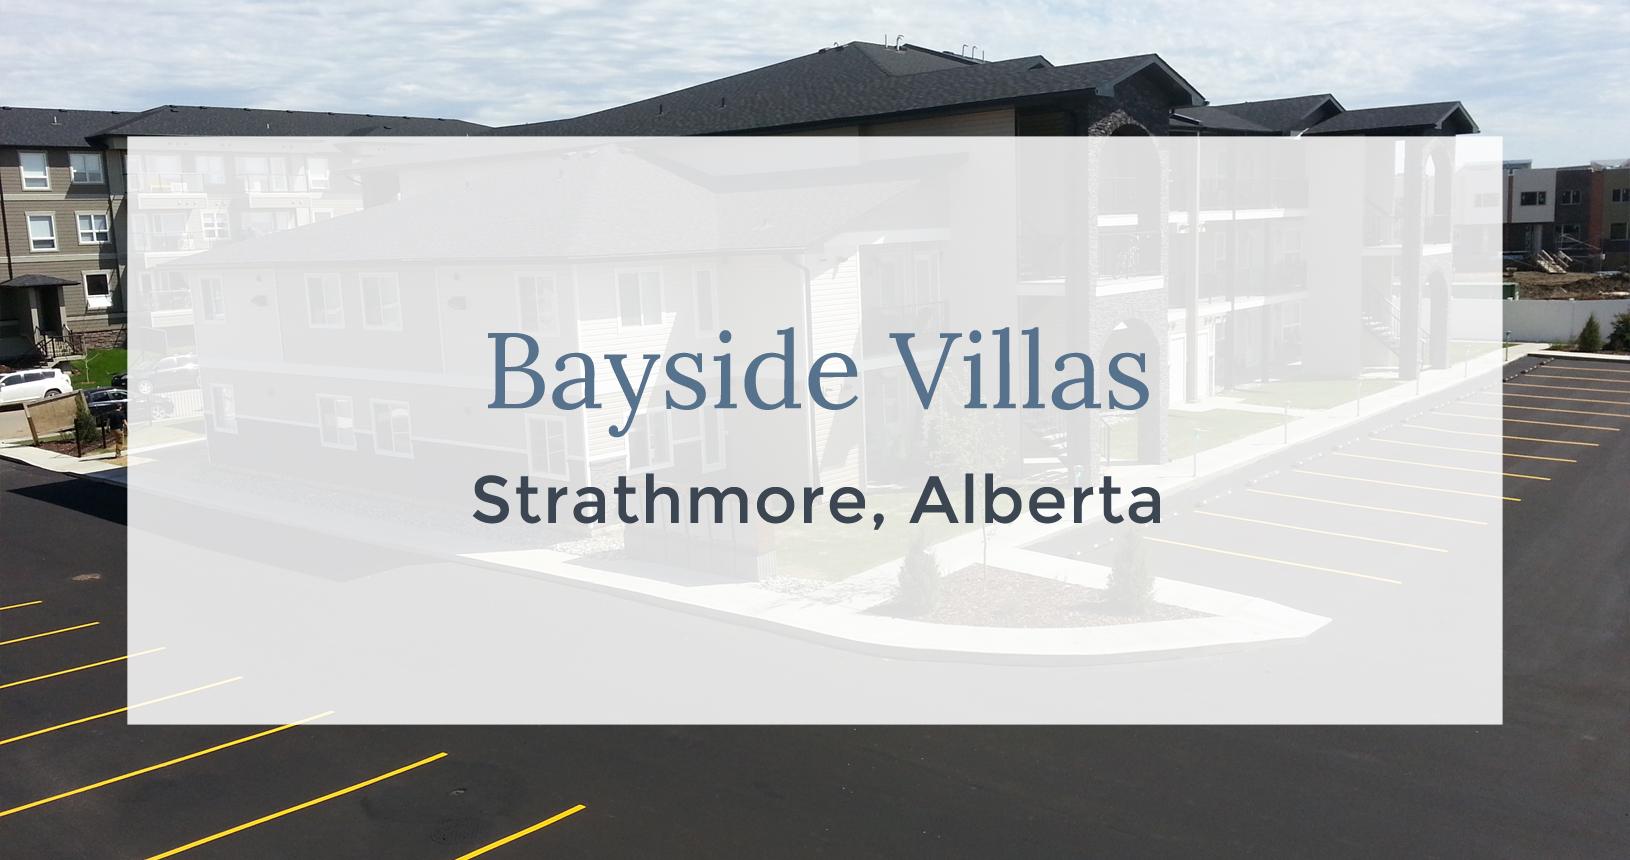 Bayside Villas: Strathmore, Alberta